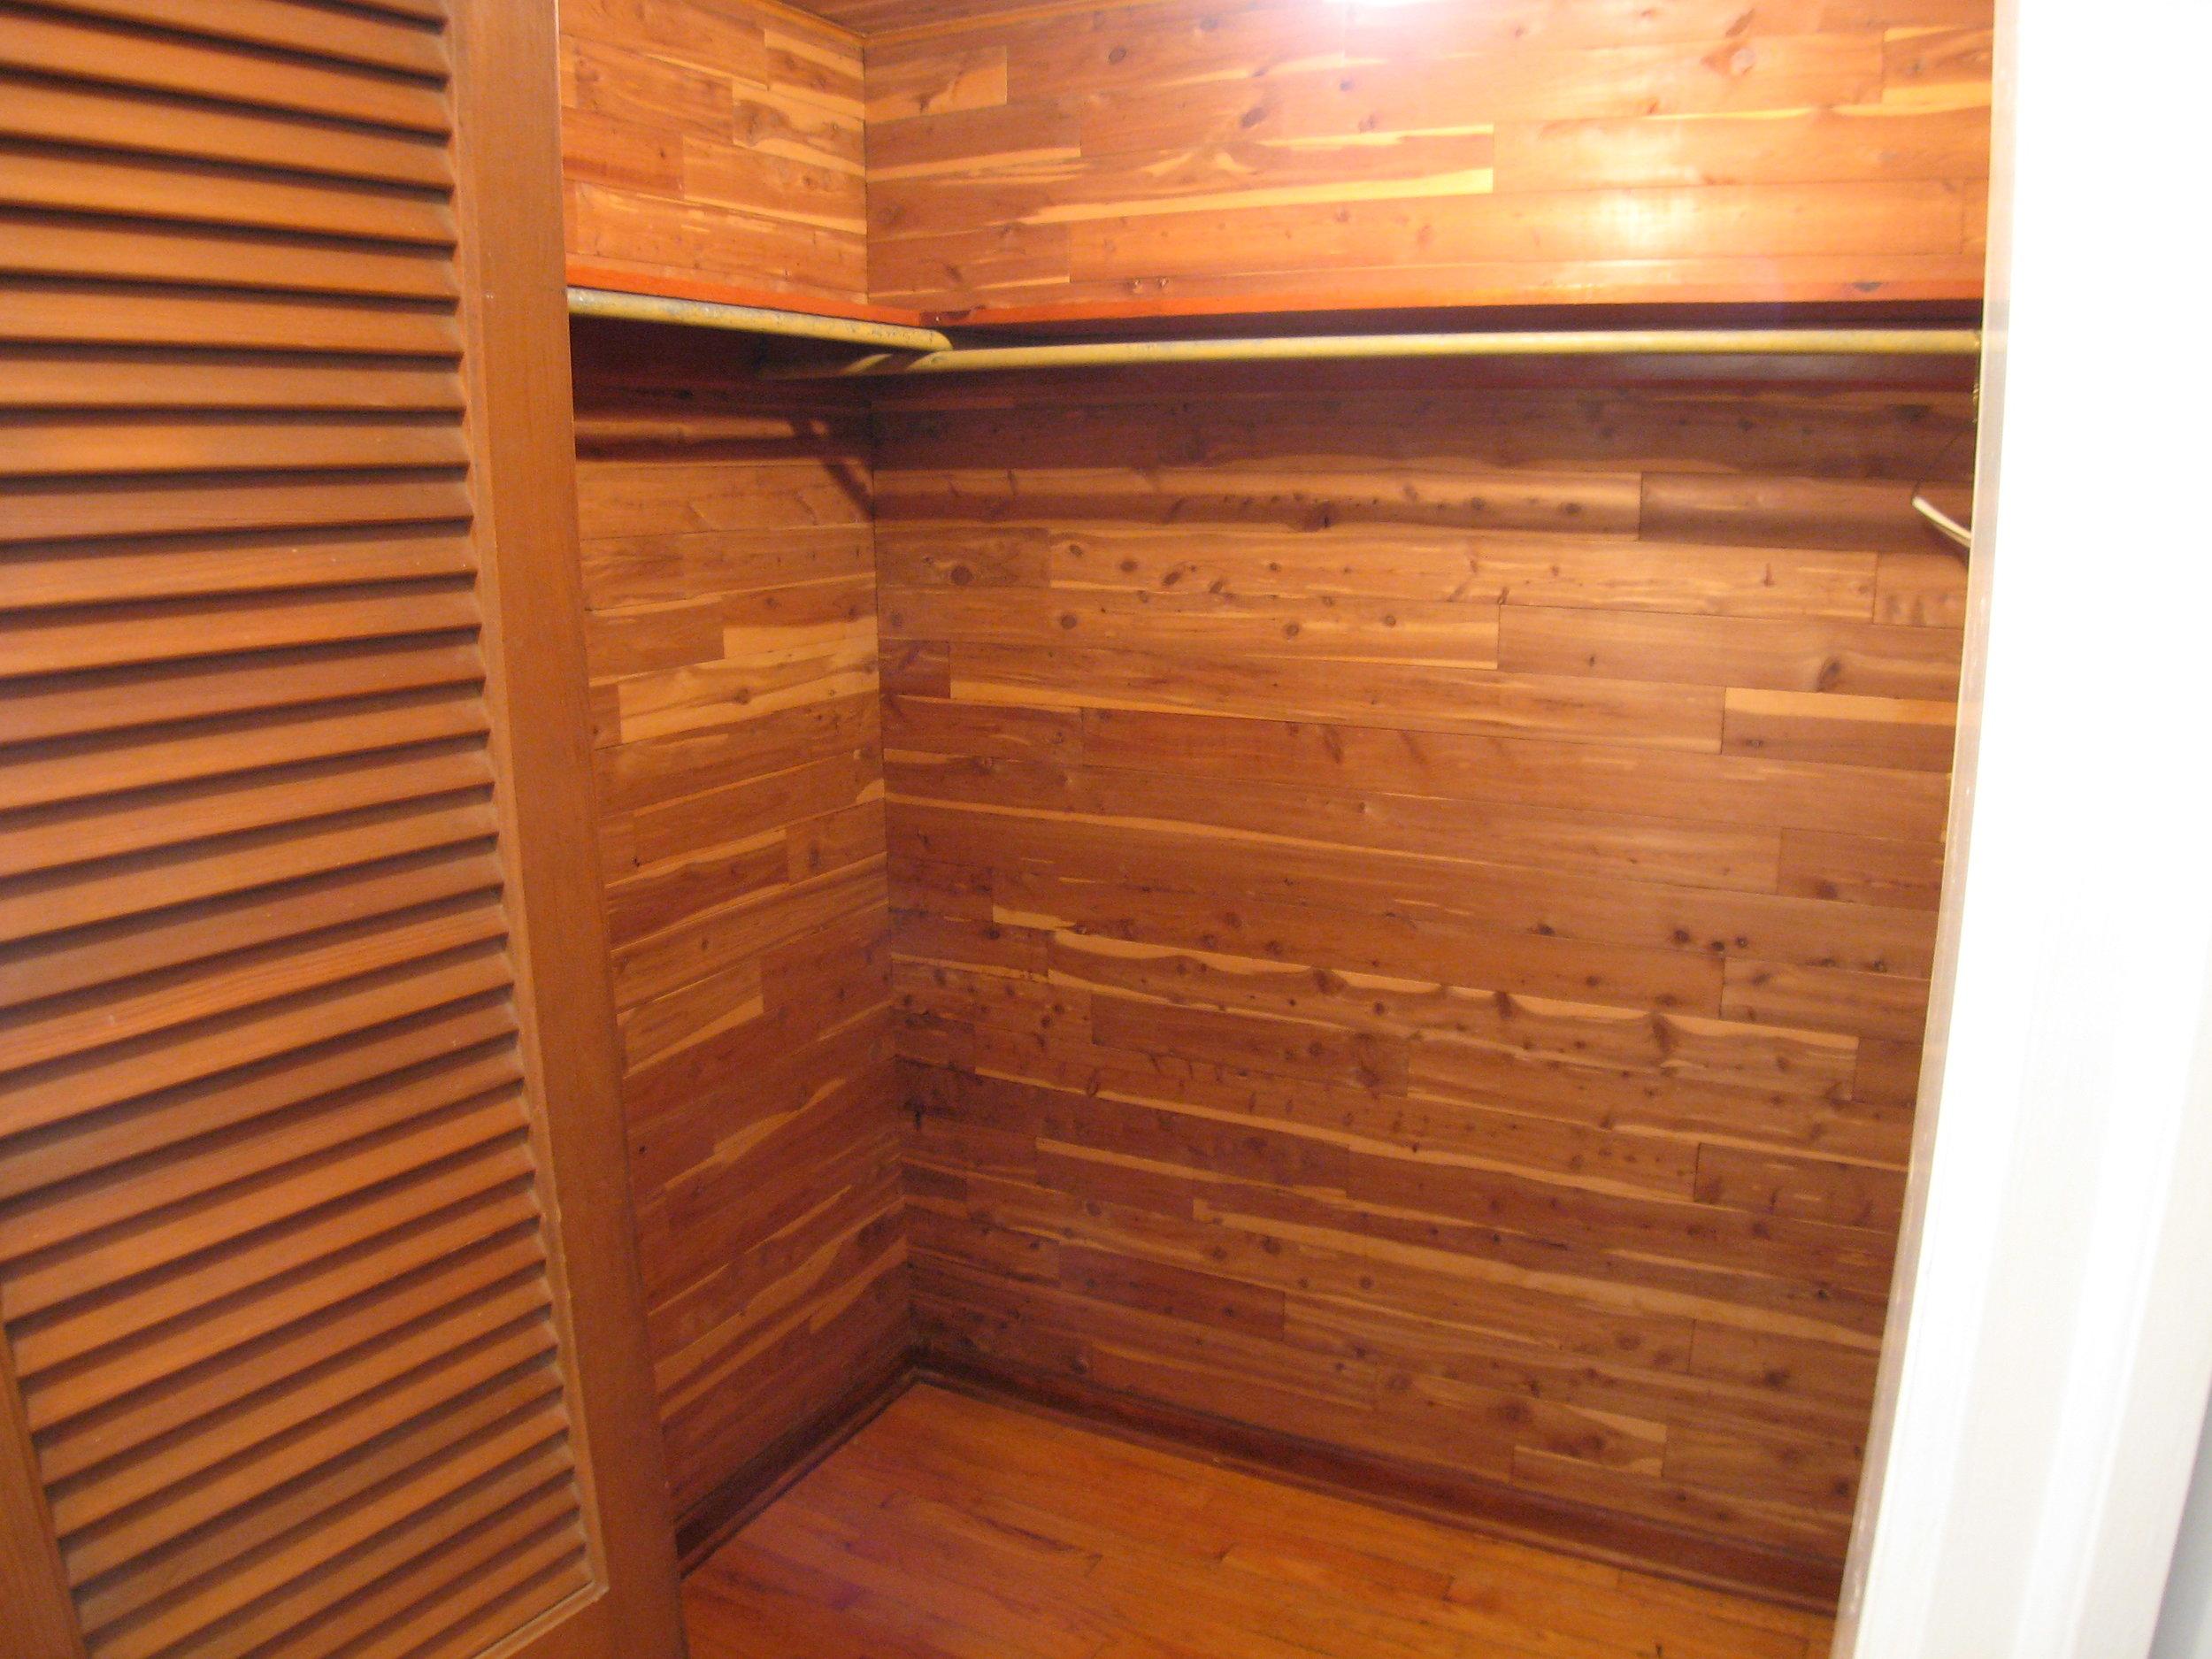 Cedar Closet at end of Hall